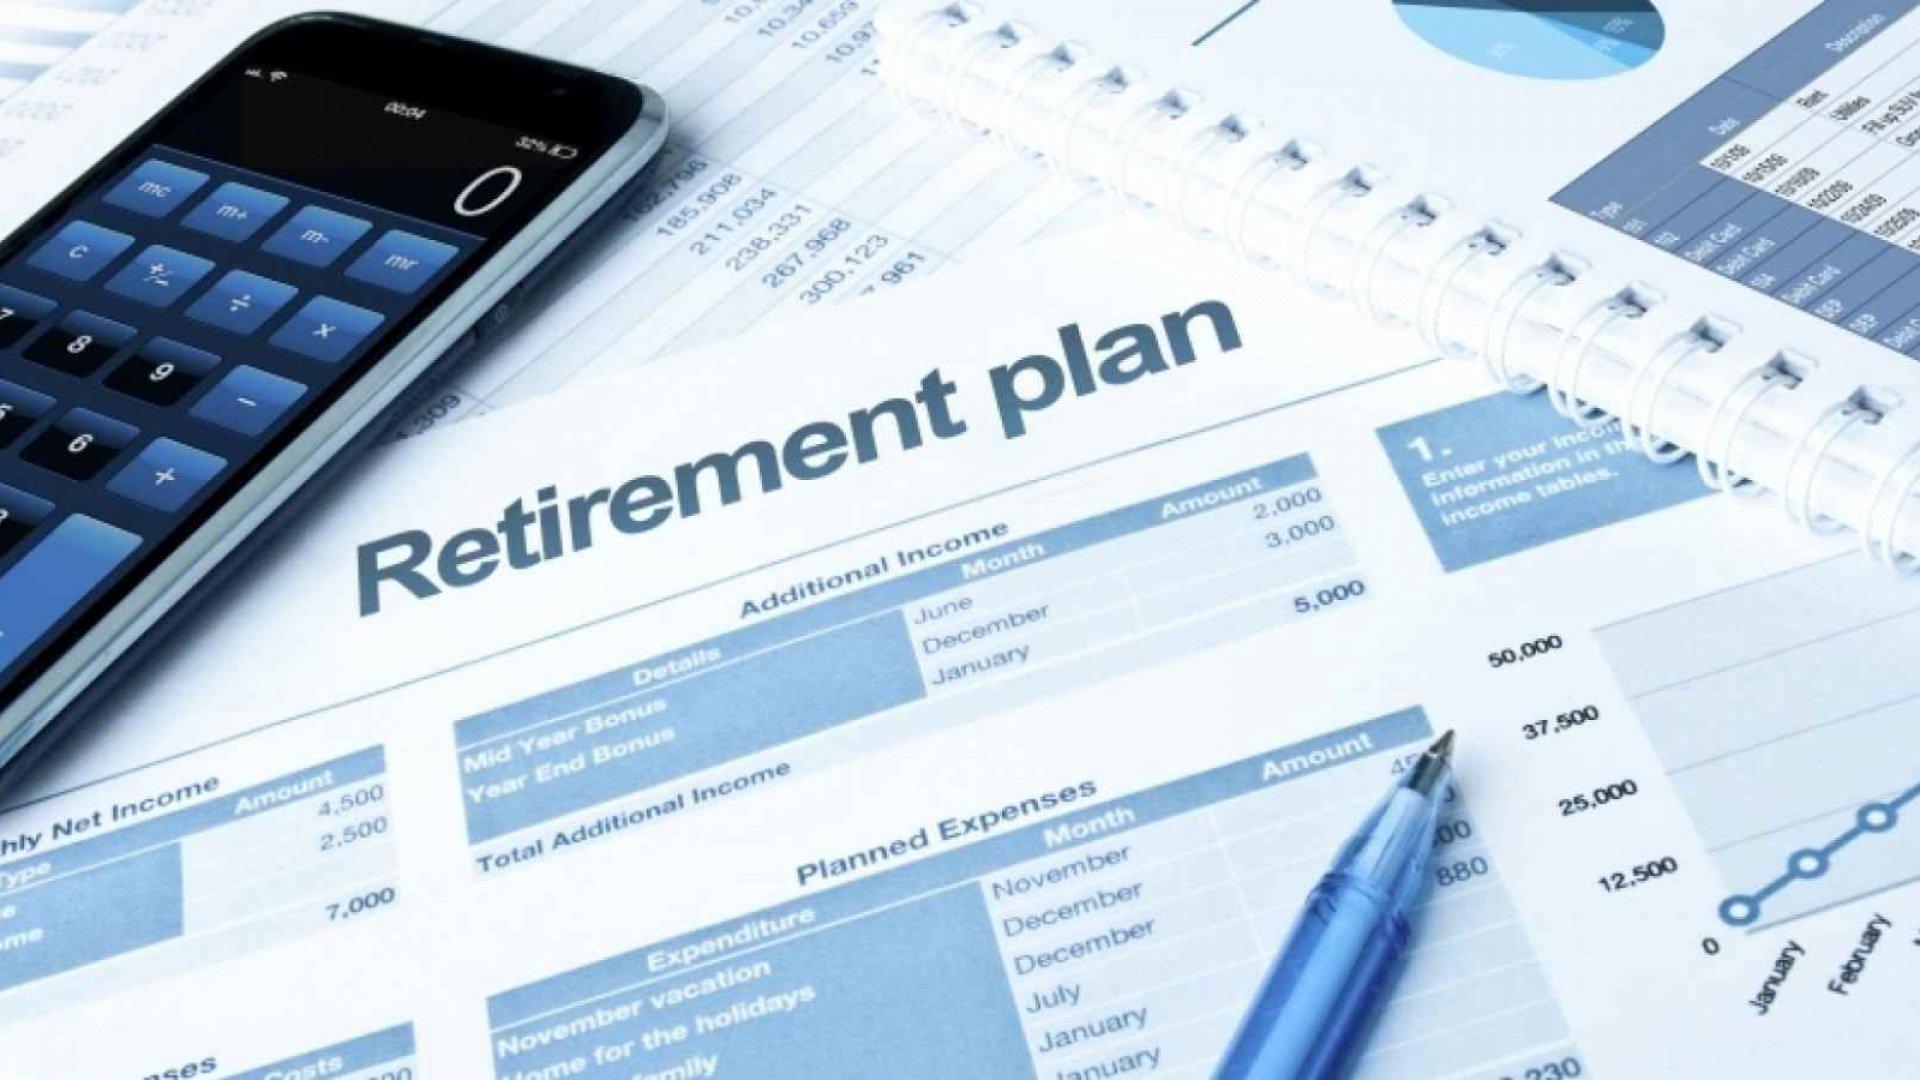 How to Retire as an Entrepreneur